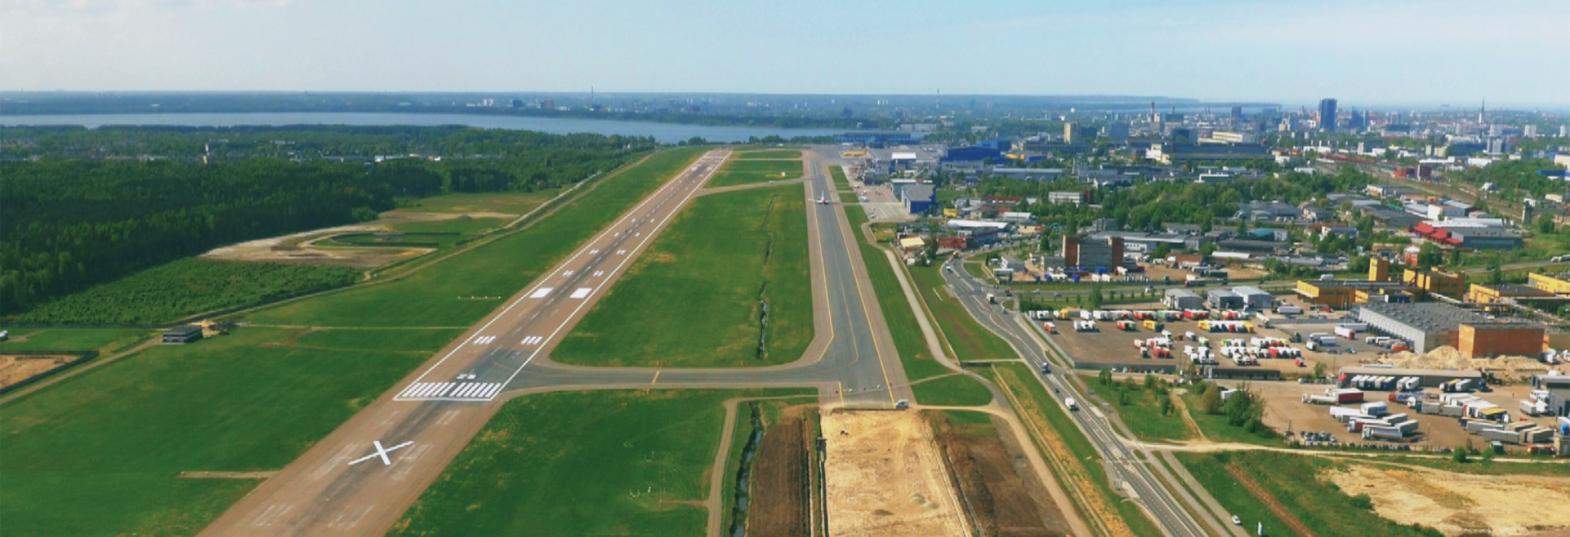 lennujaama runway